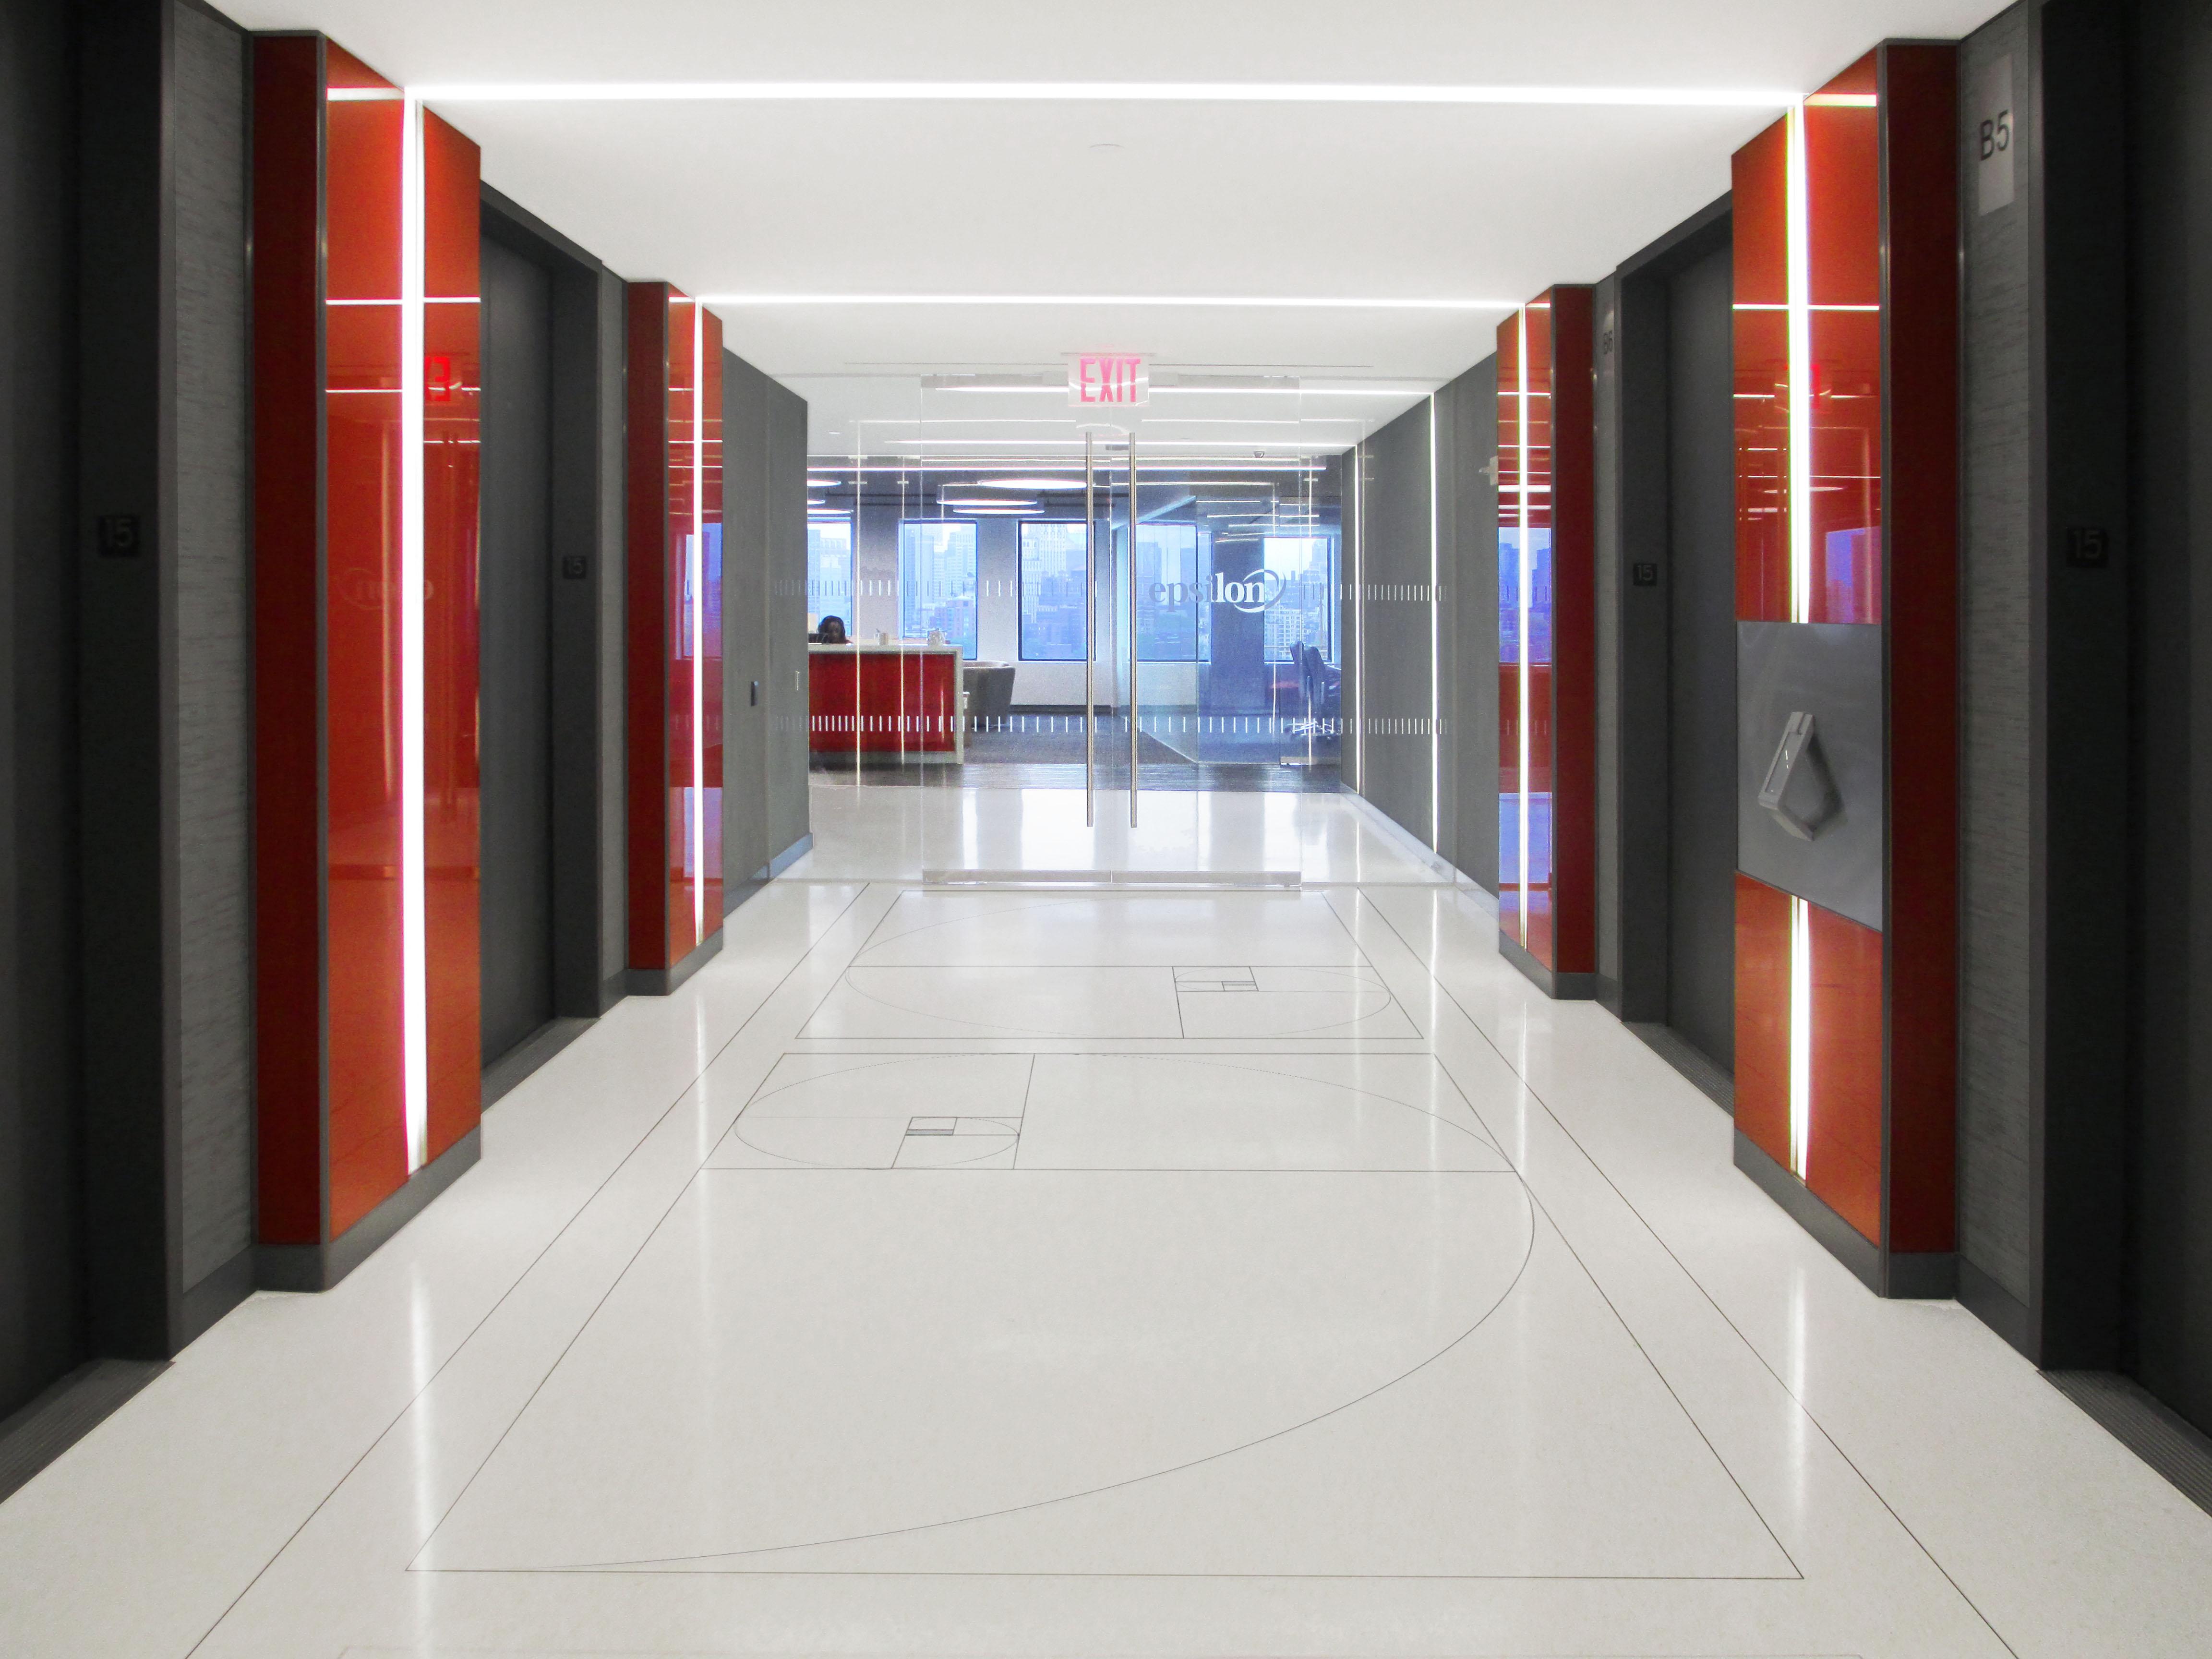 ELEVATOR CORE 2